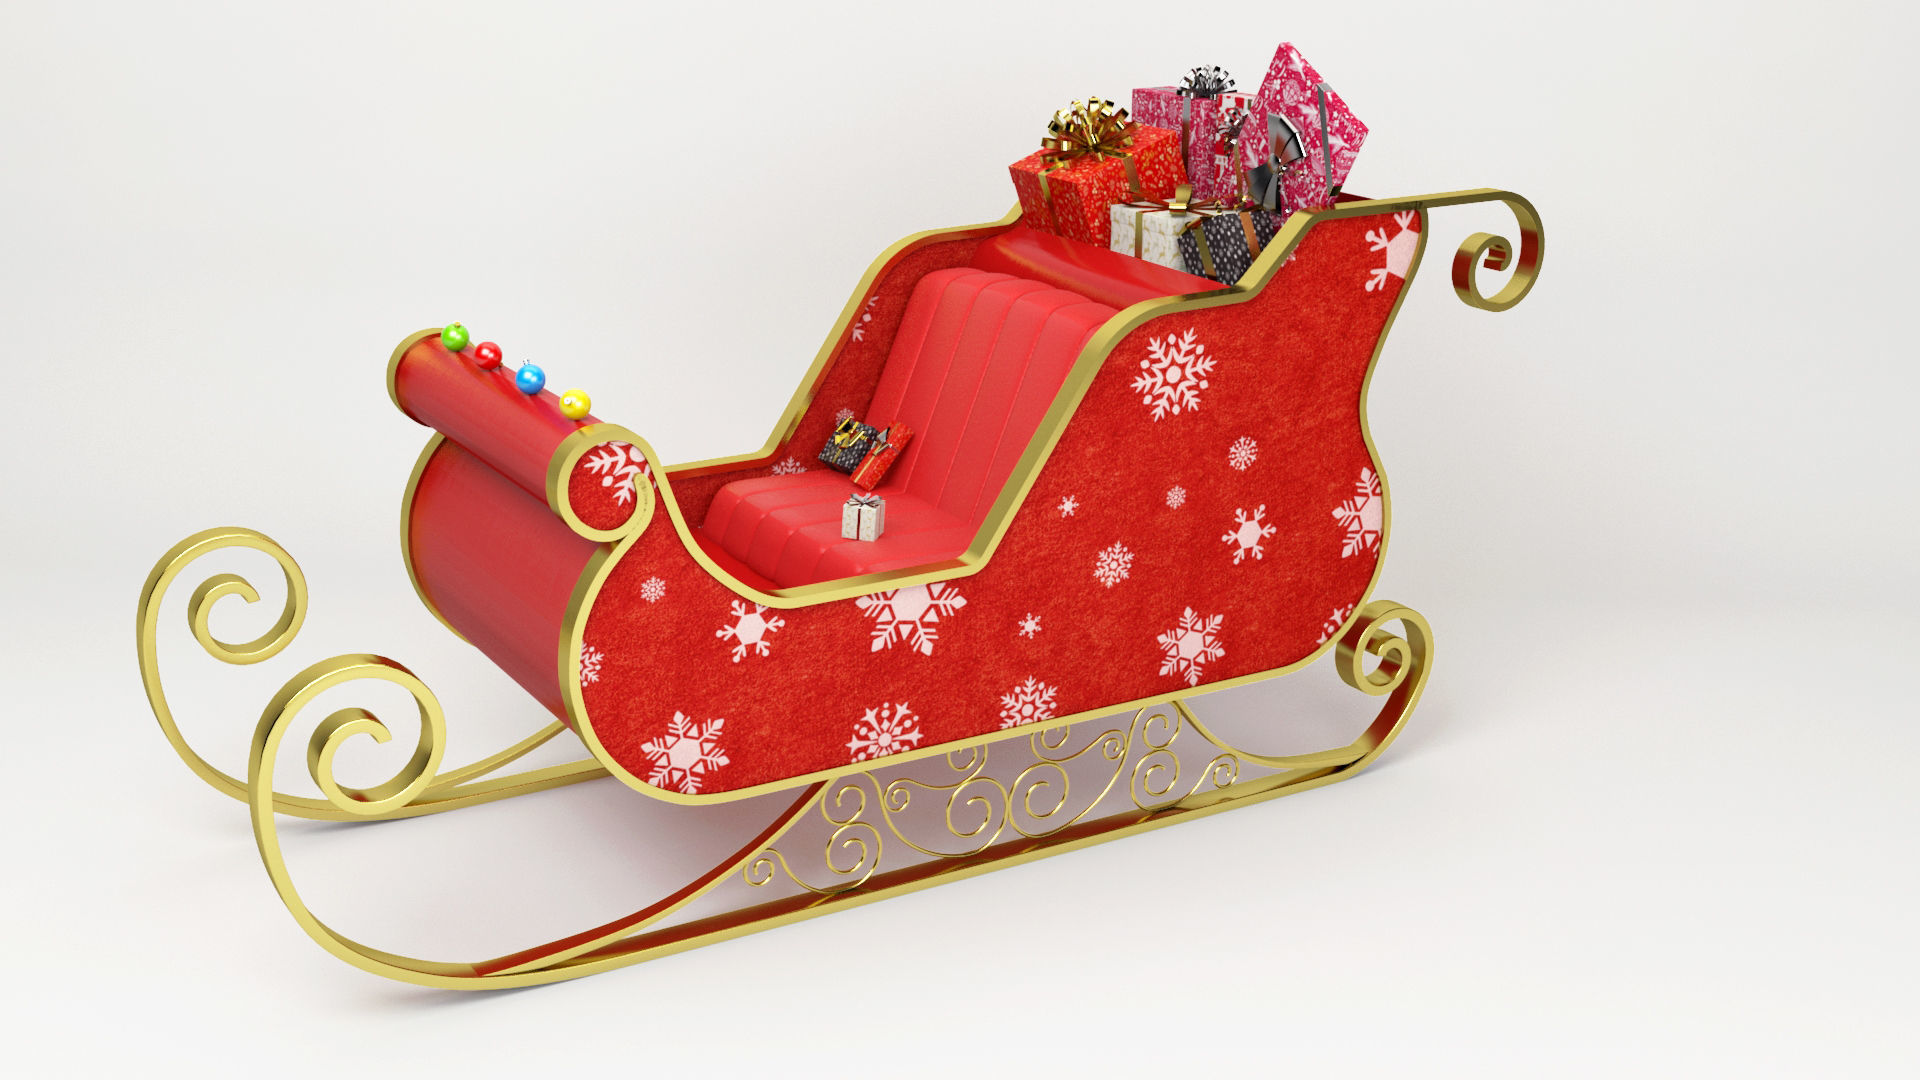 Santa Claus Sled - Christmas Sled - Chritmas Gift -